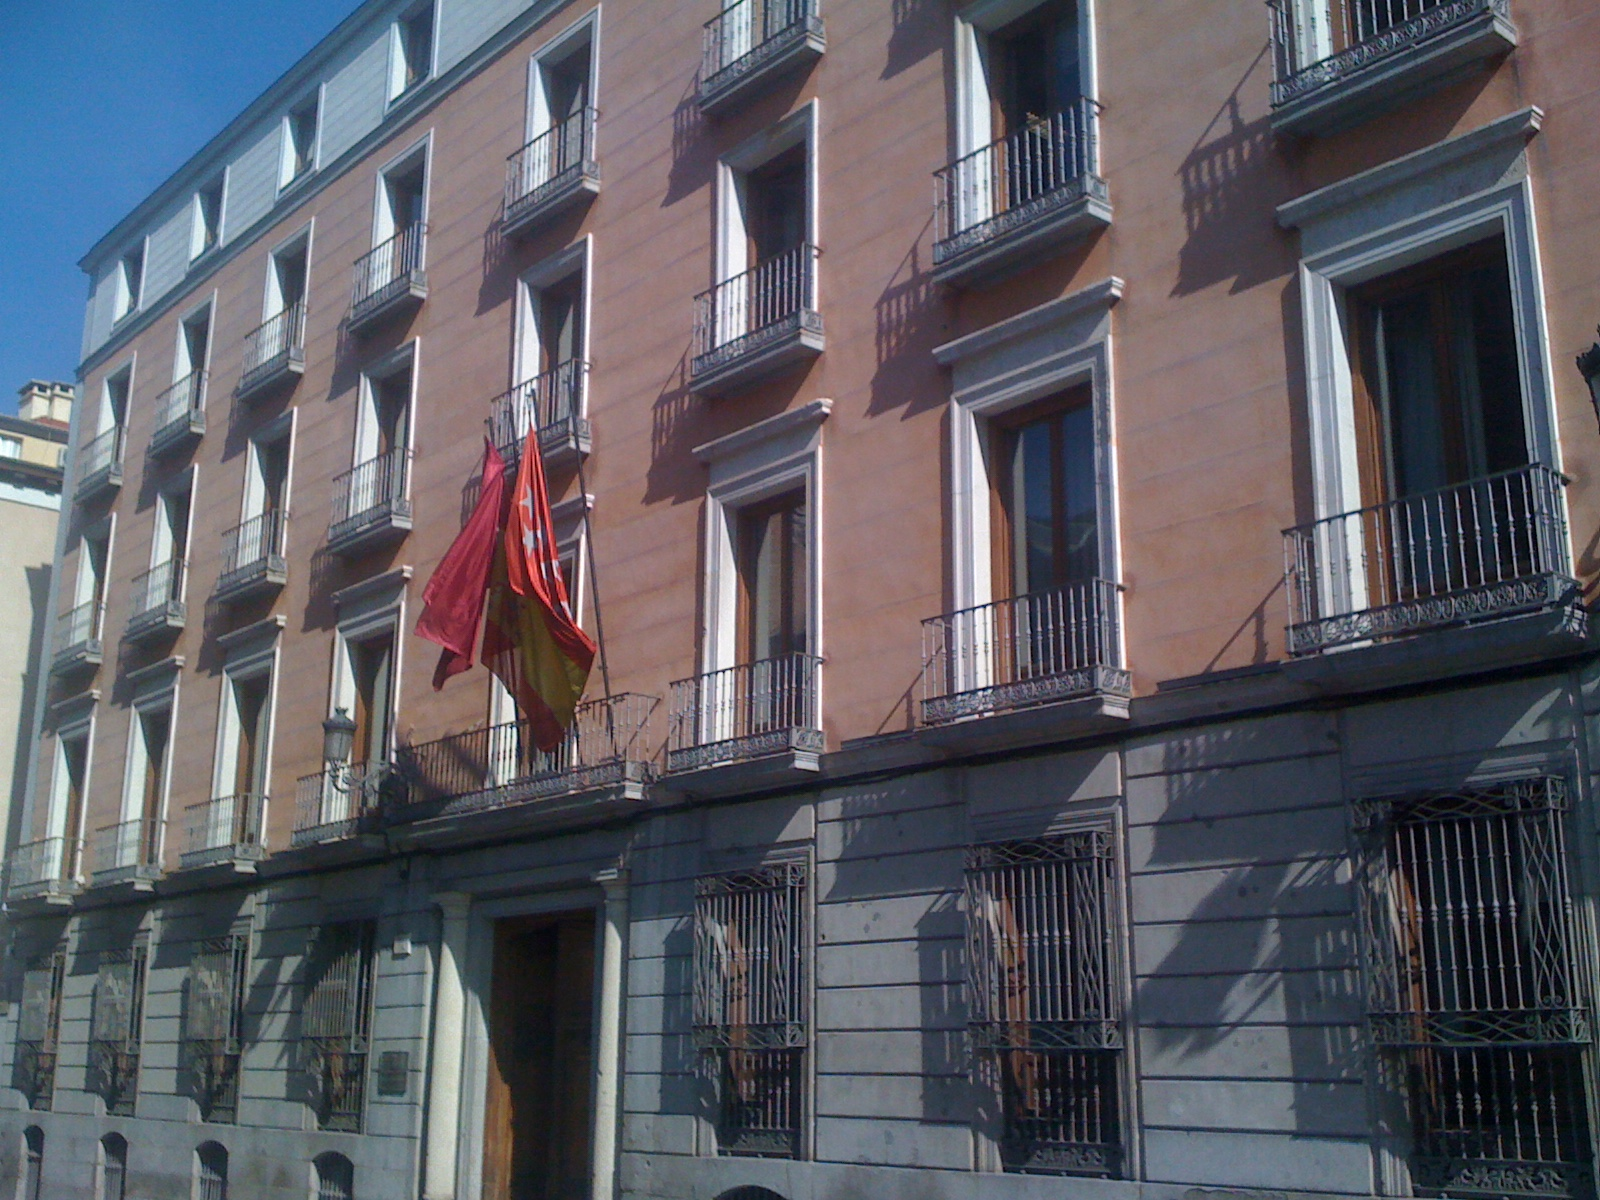 oficina de correos distrito centro madrid